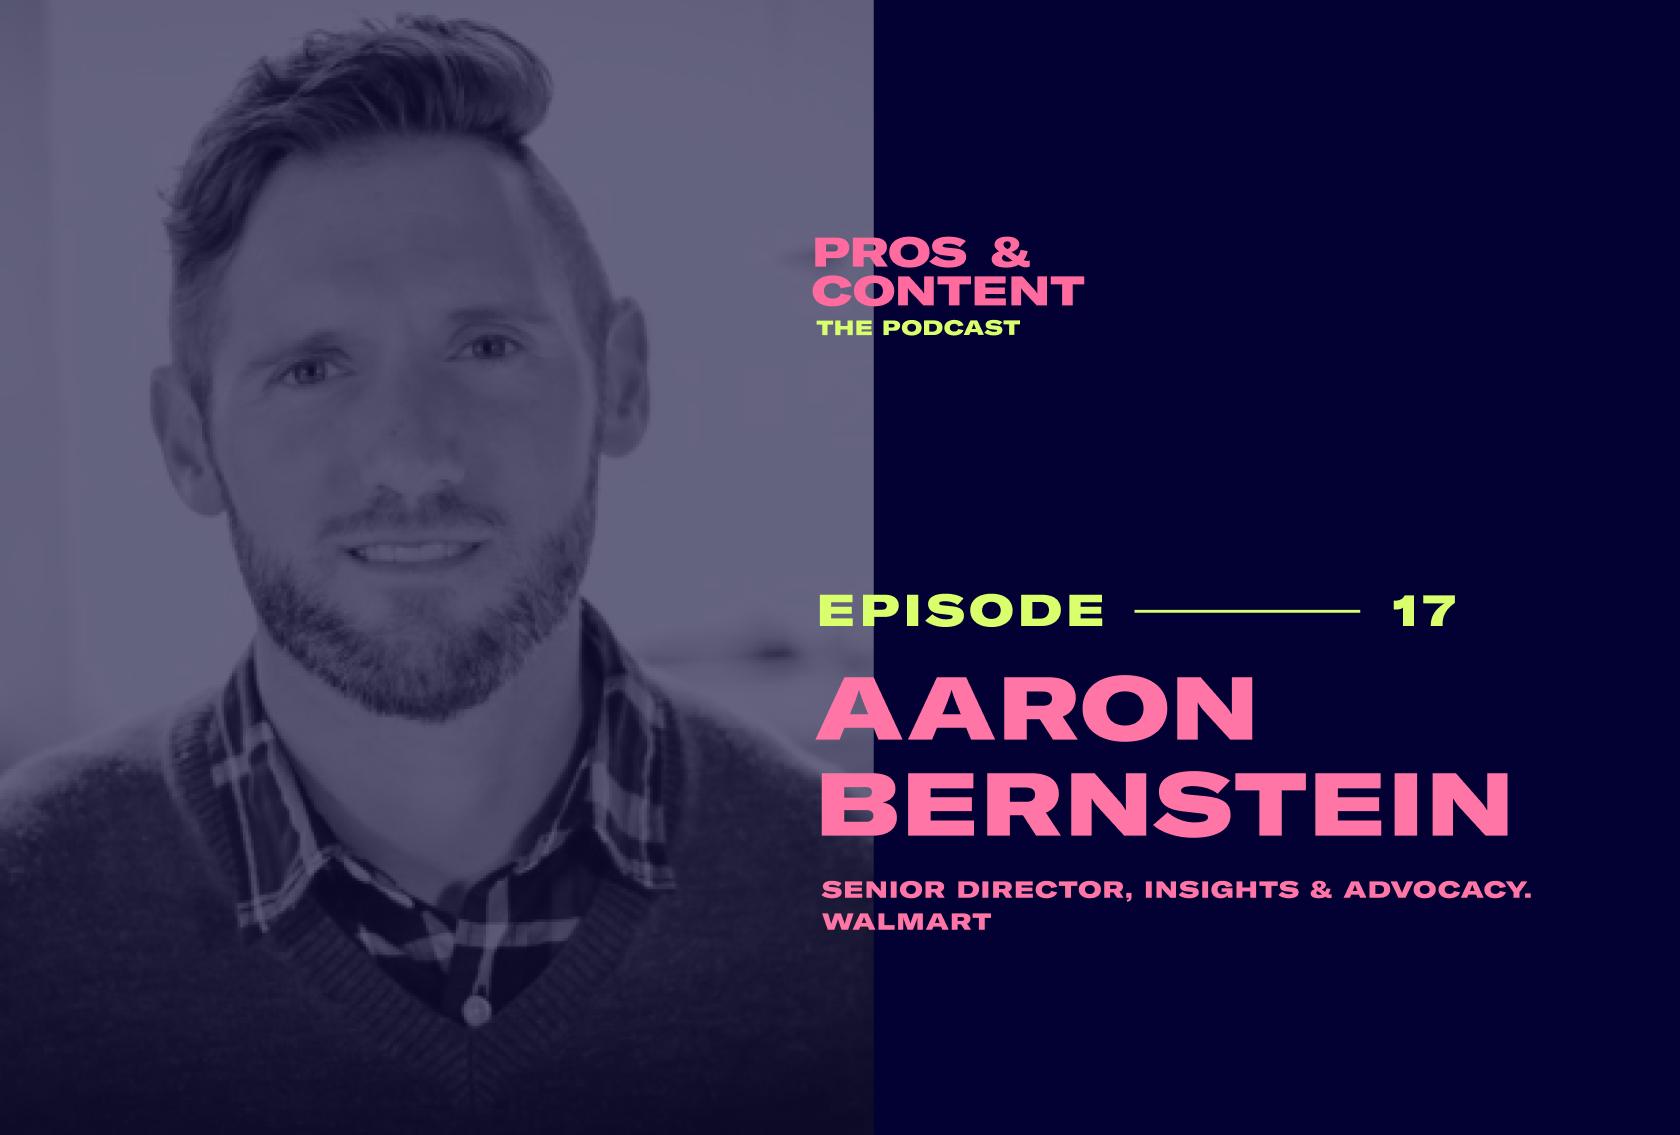 Pros & Content Podcast: Aaron Bernstein